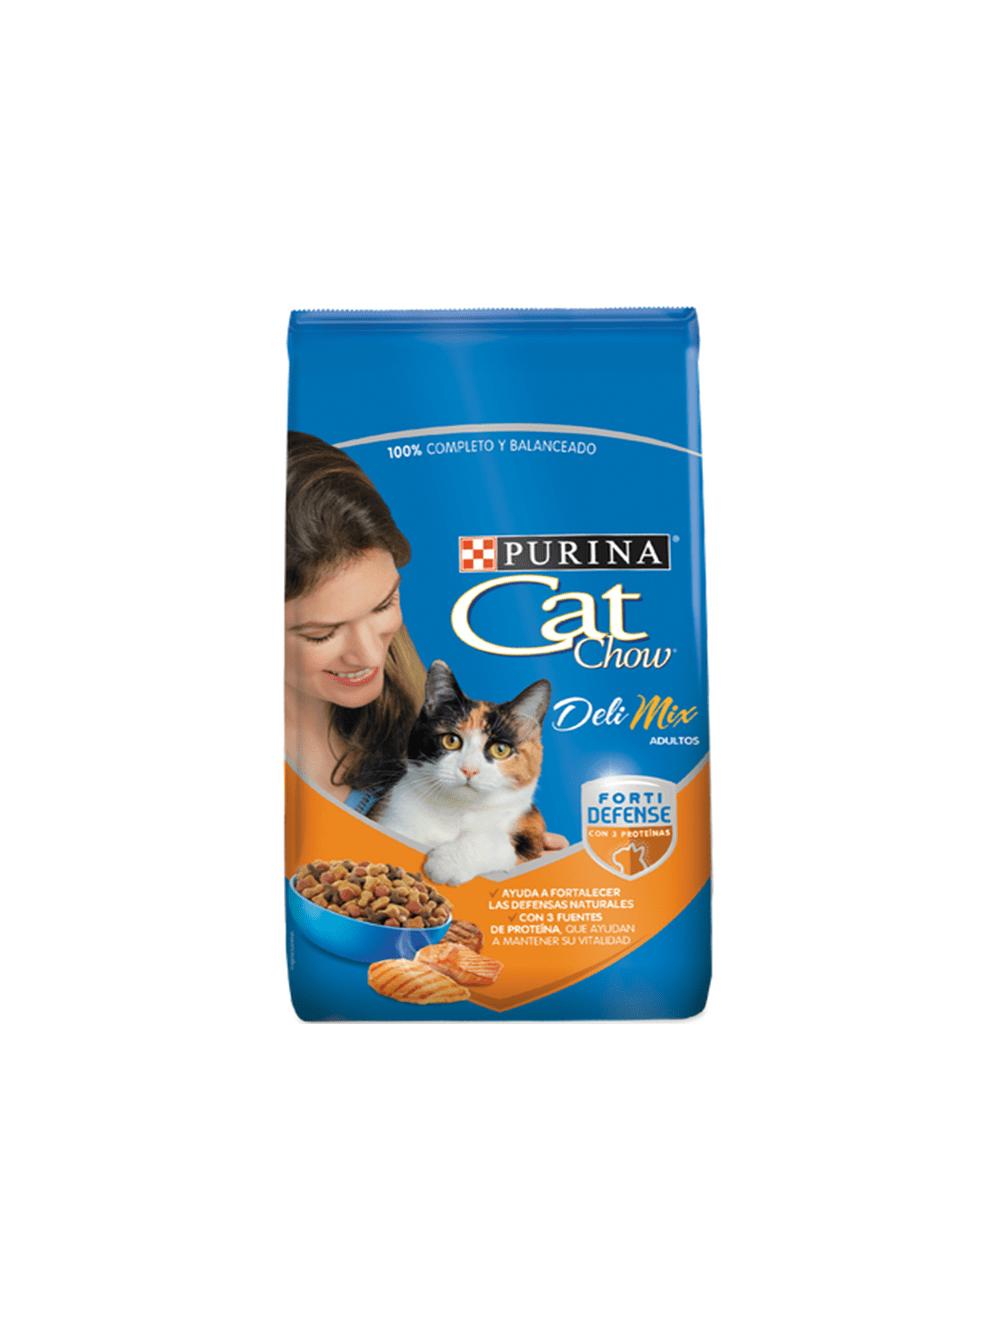 Purina Cat Chow Delimix 3 kg